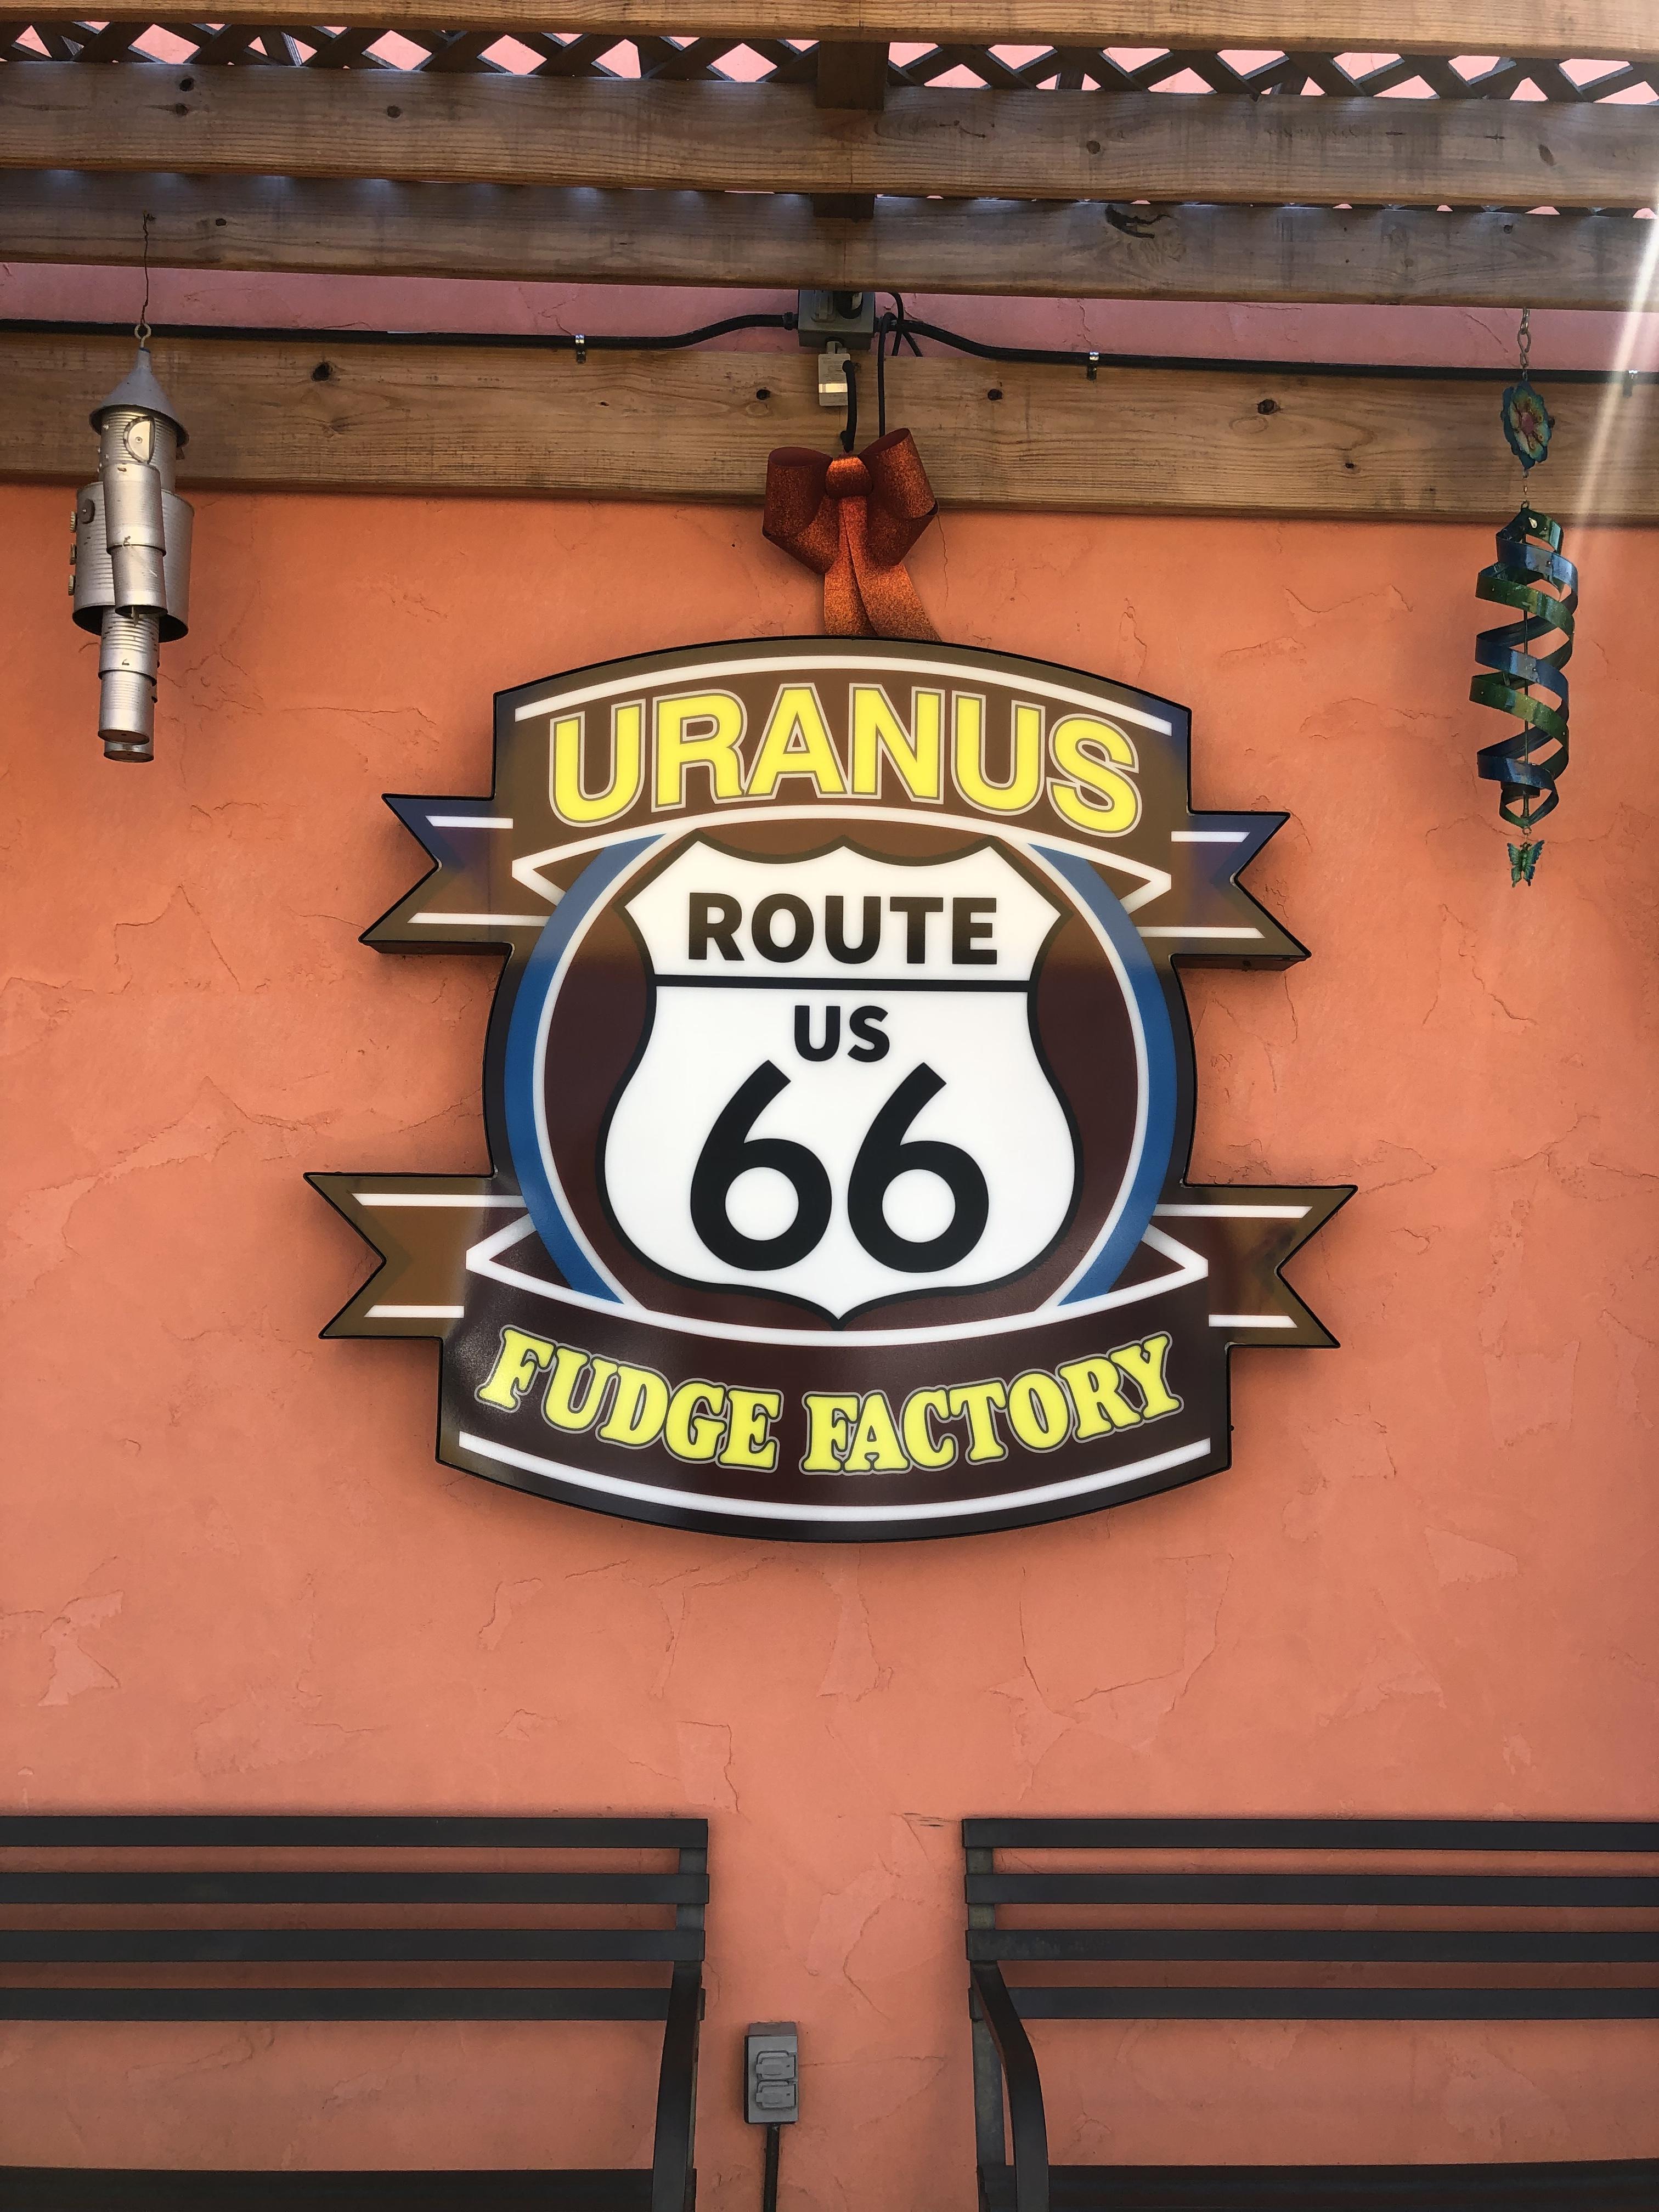 Uranus Fudge Factory / Oh Fiddle Dee Dee